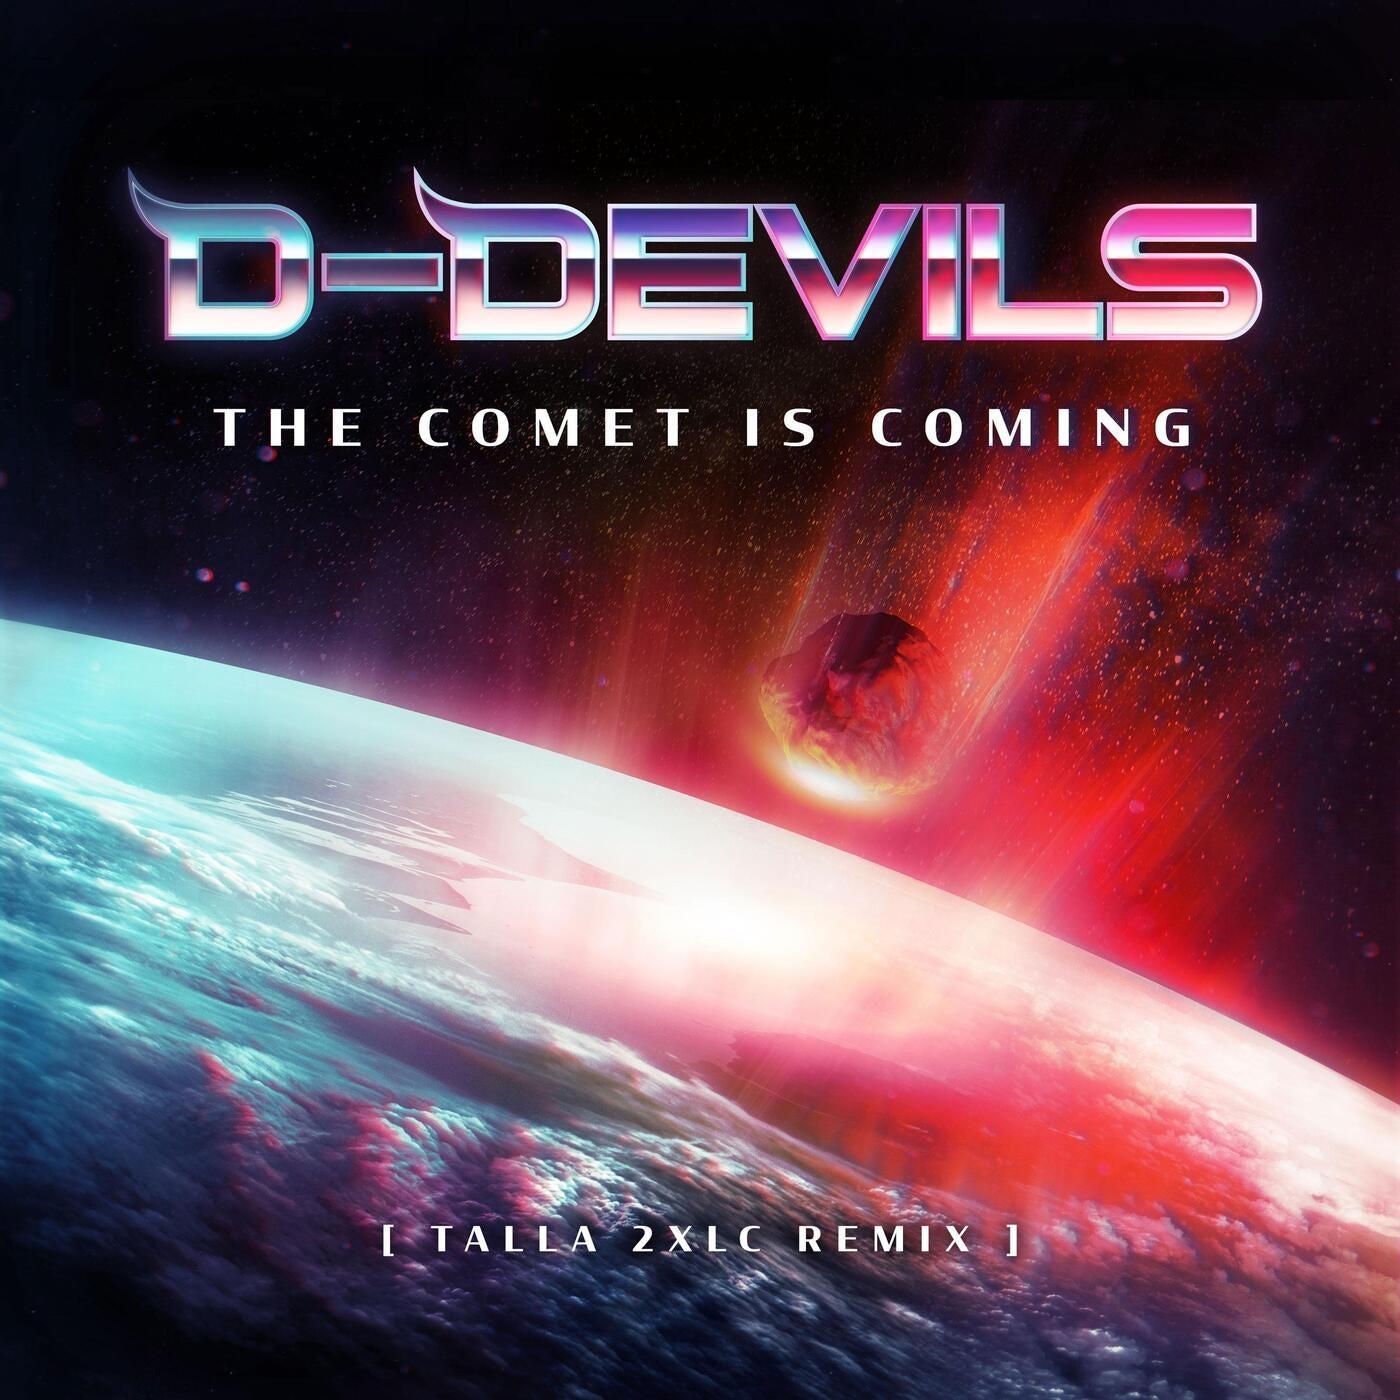 The Comet Is Coming (Talla 2XLC Remix)